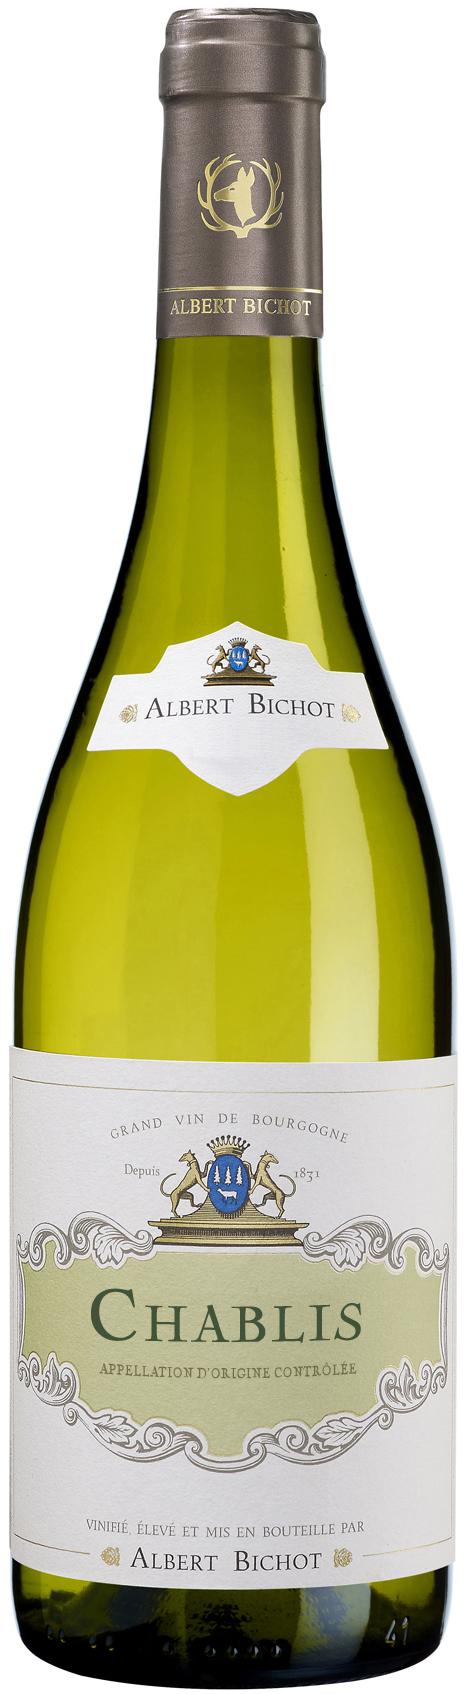 Albert Bichot Chablis 2019